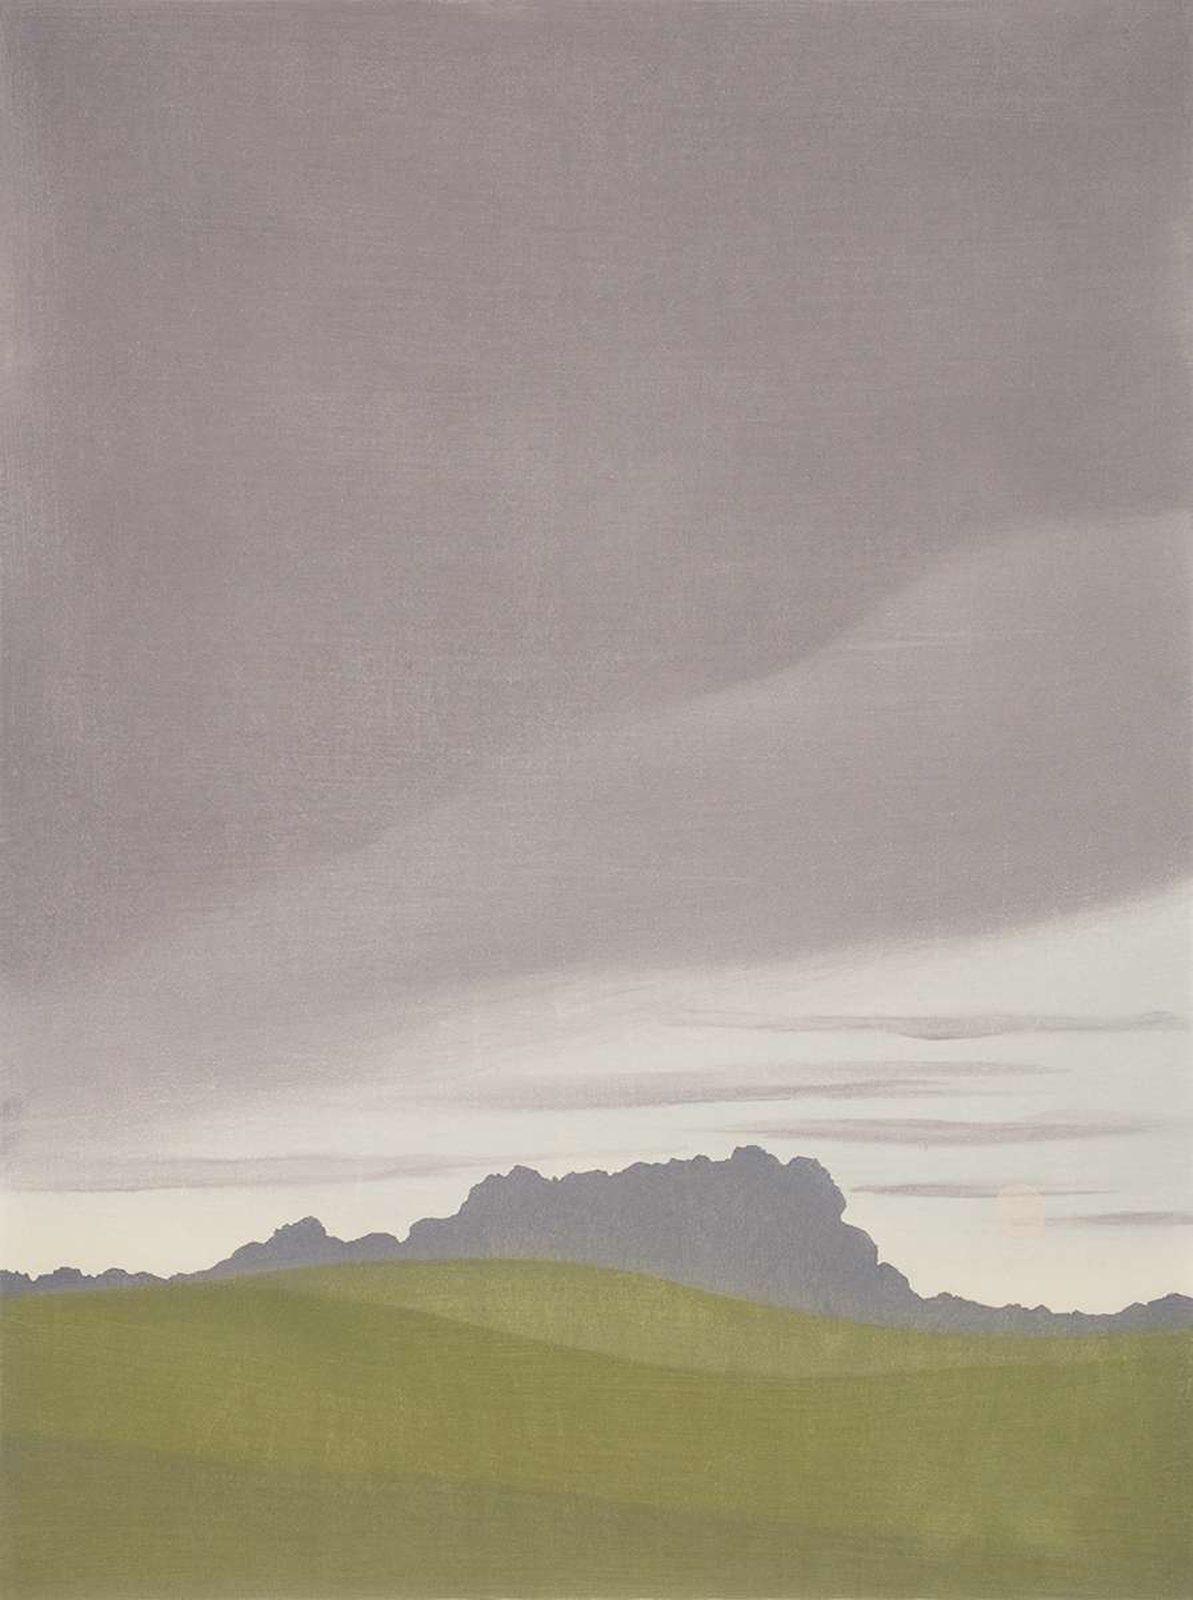 Sara Lee, Hunters Moon, 2020, Courtesy of Rabley Gallery